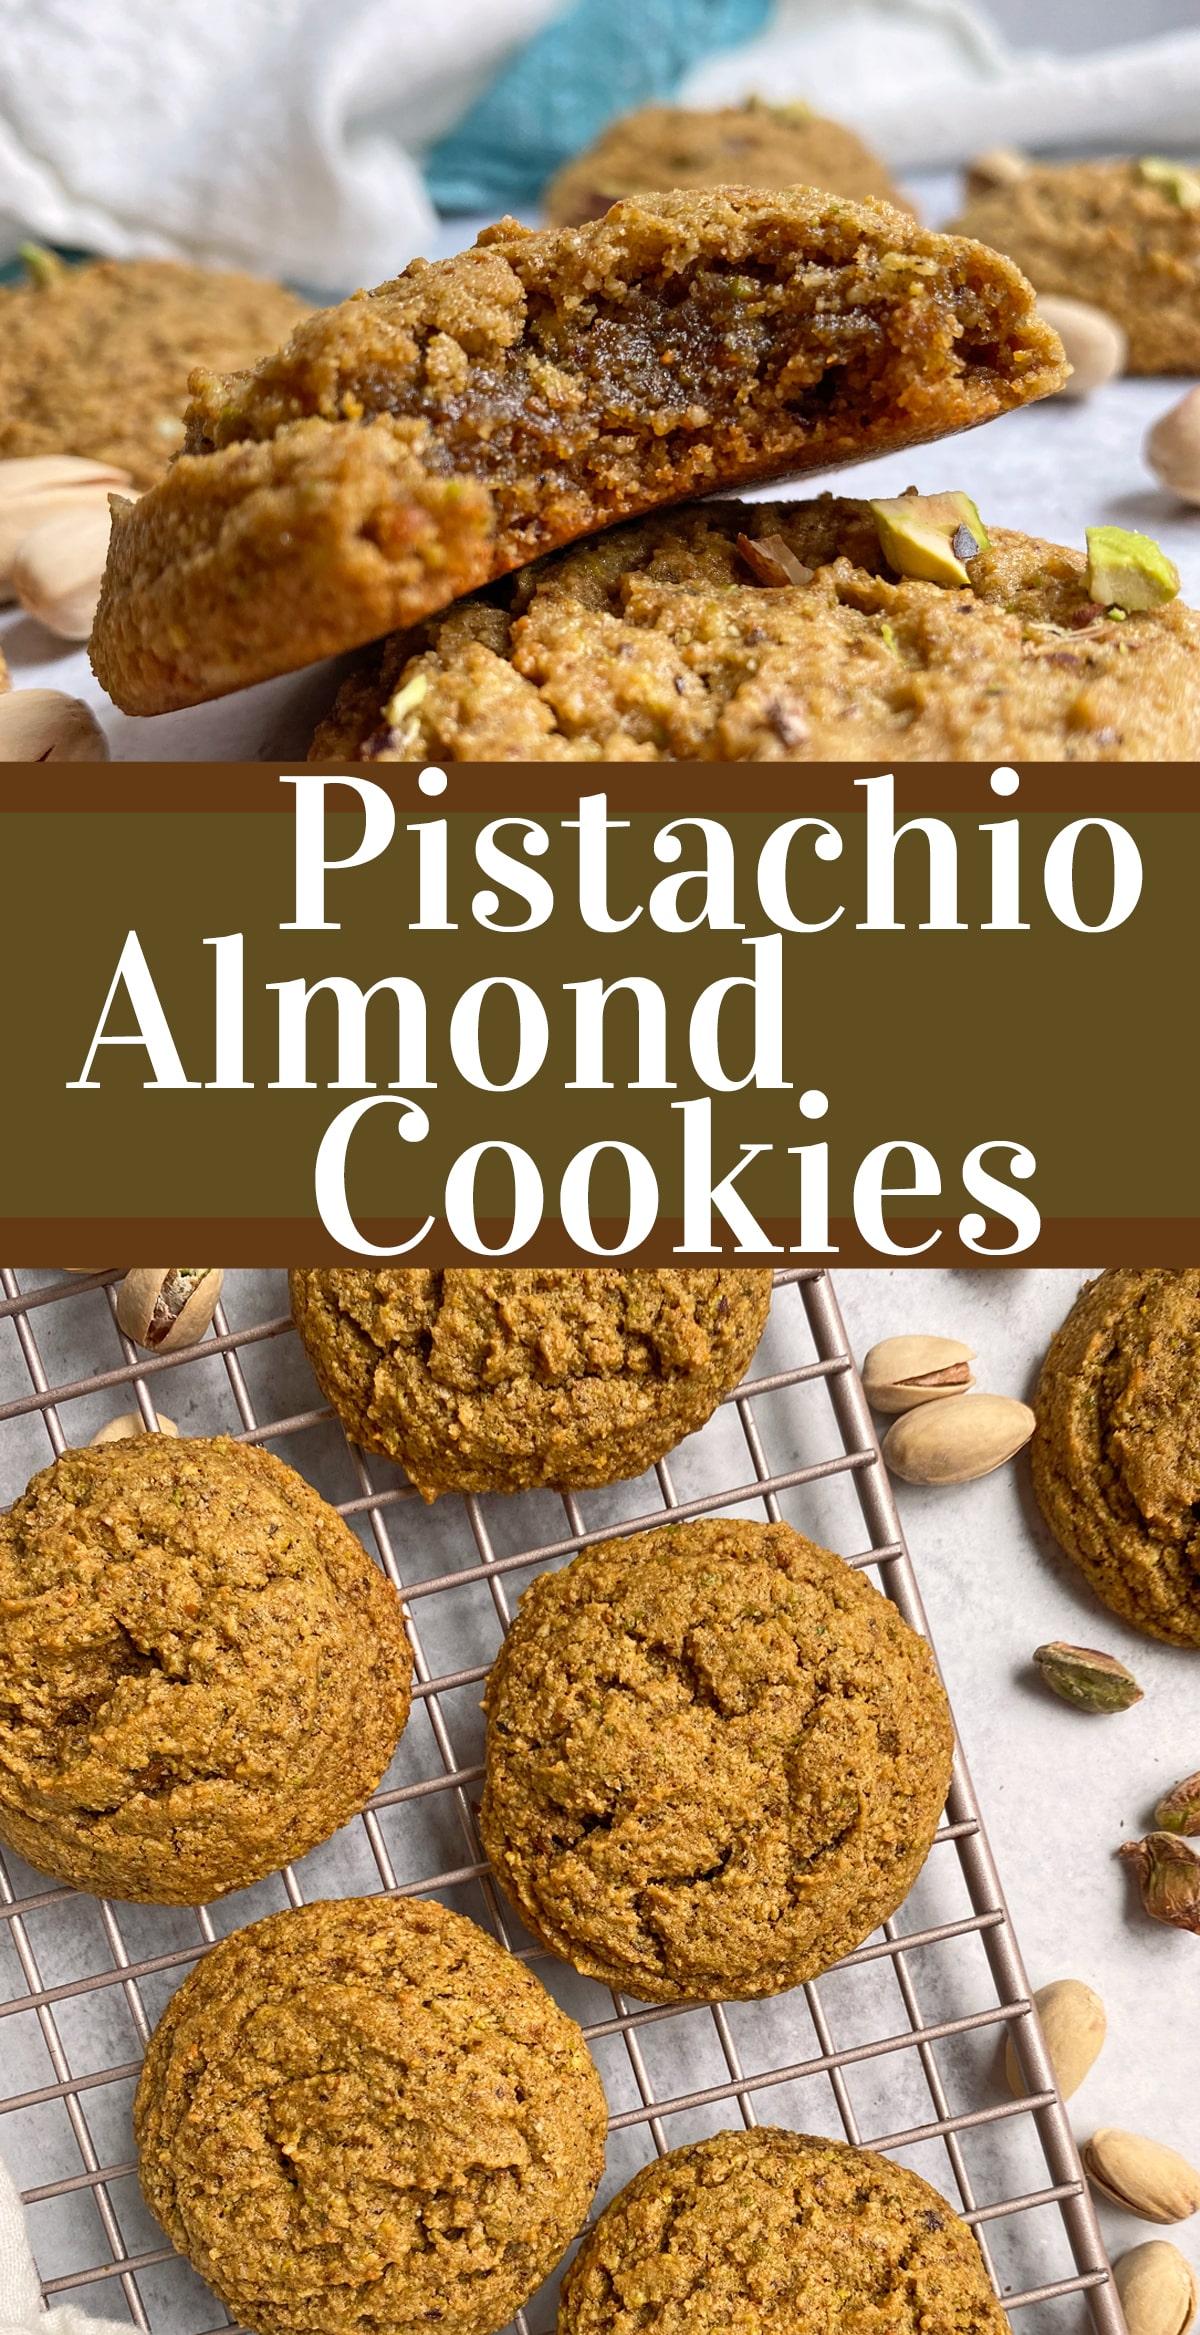 pistachio-almond-cookie-pinterest-image